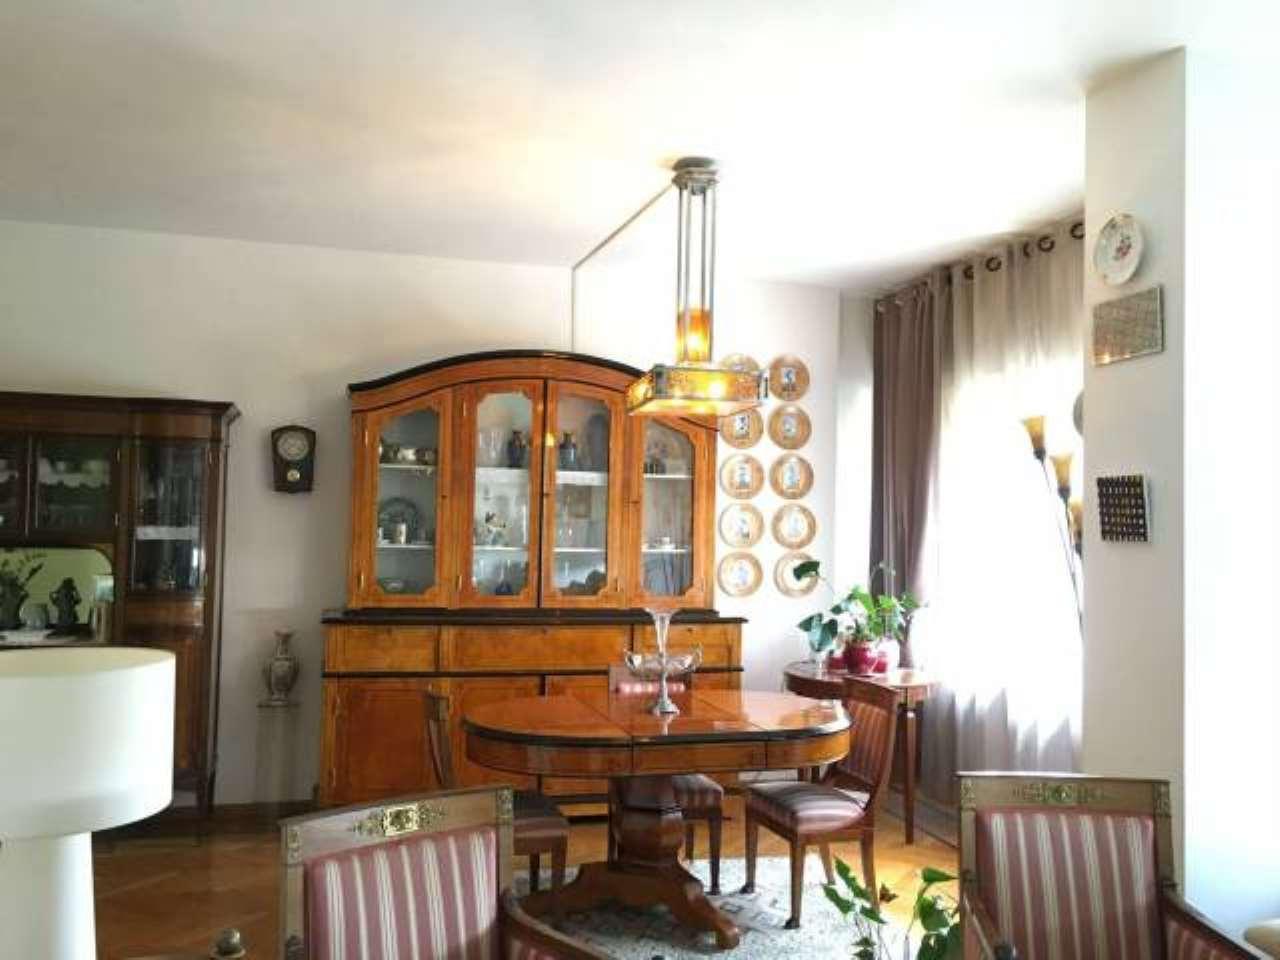 Appartamento in vendita Zona San Salvario - corso Massimo d'Azeglio Torino